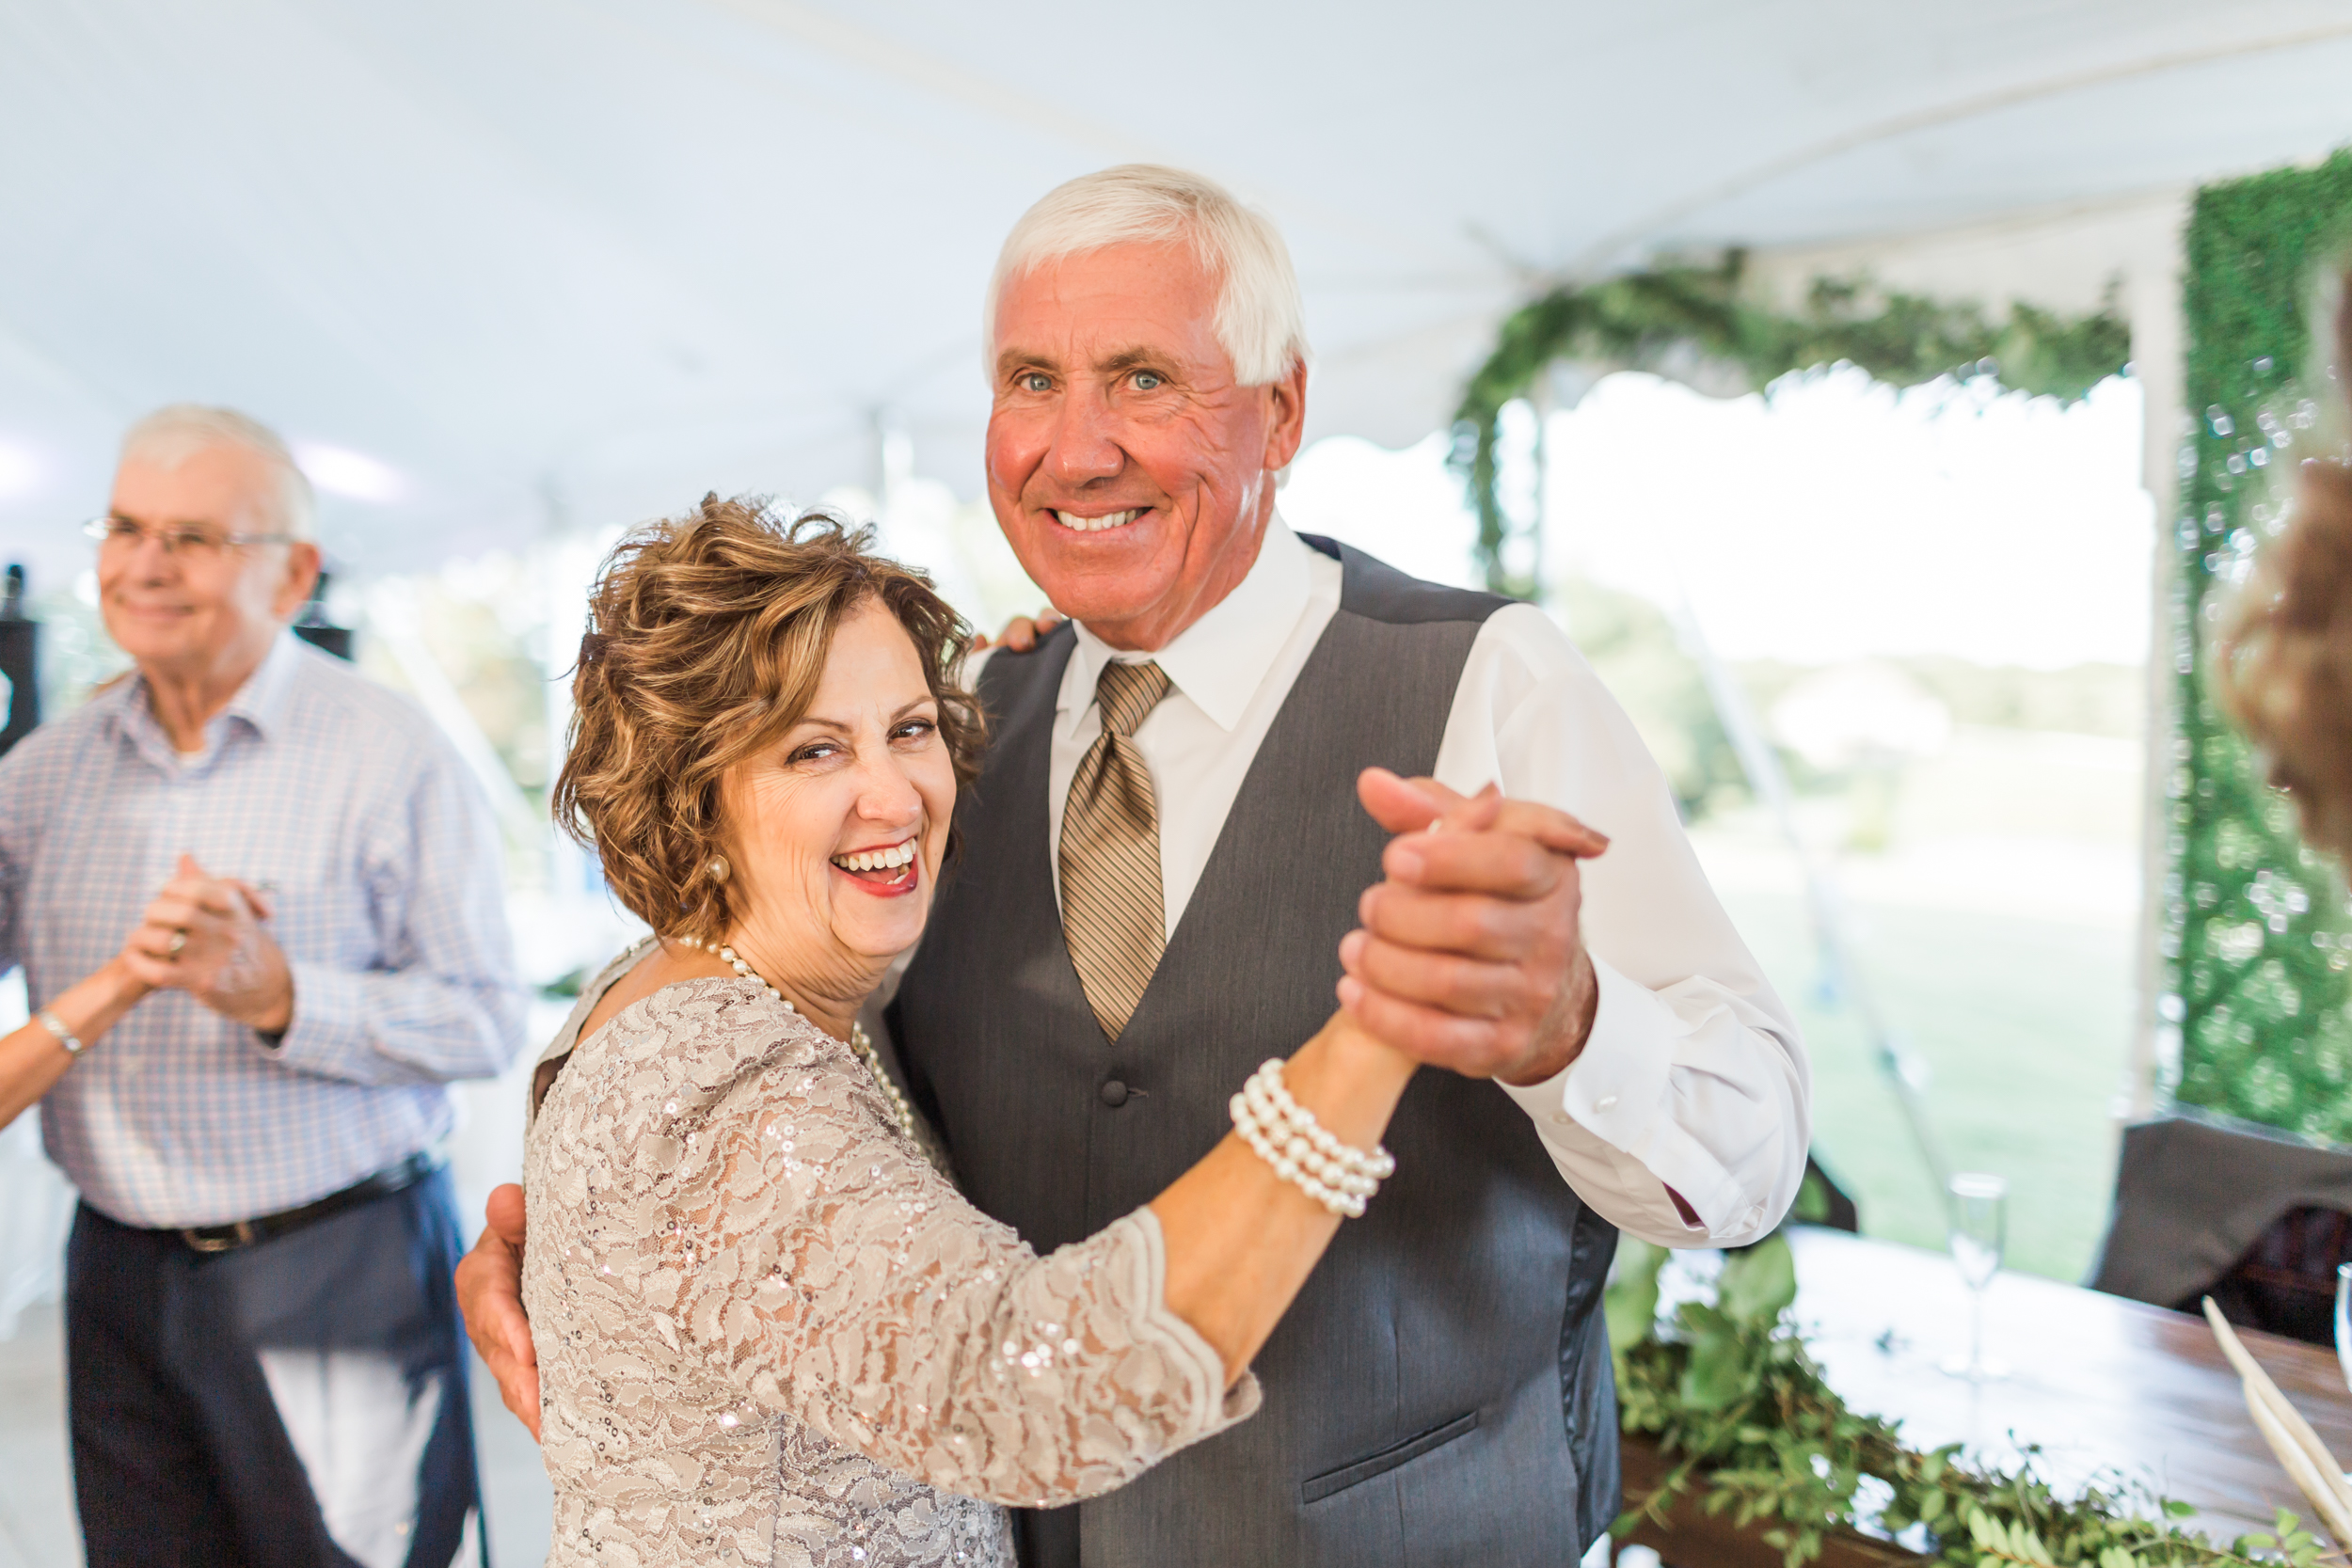 romanticcountrywedding--66.jpg